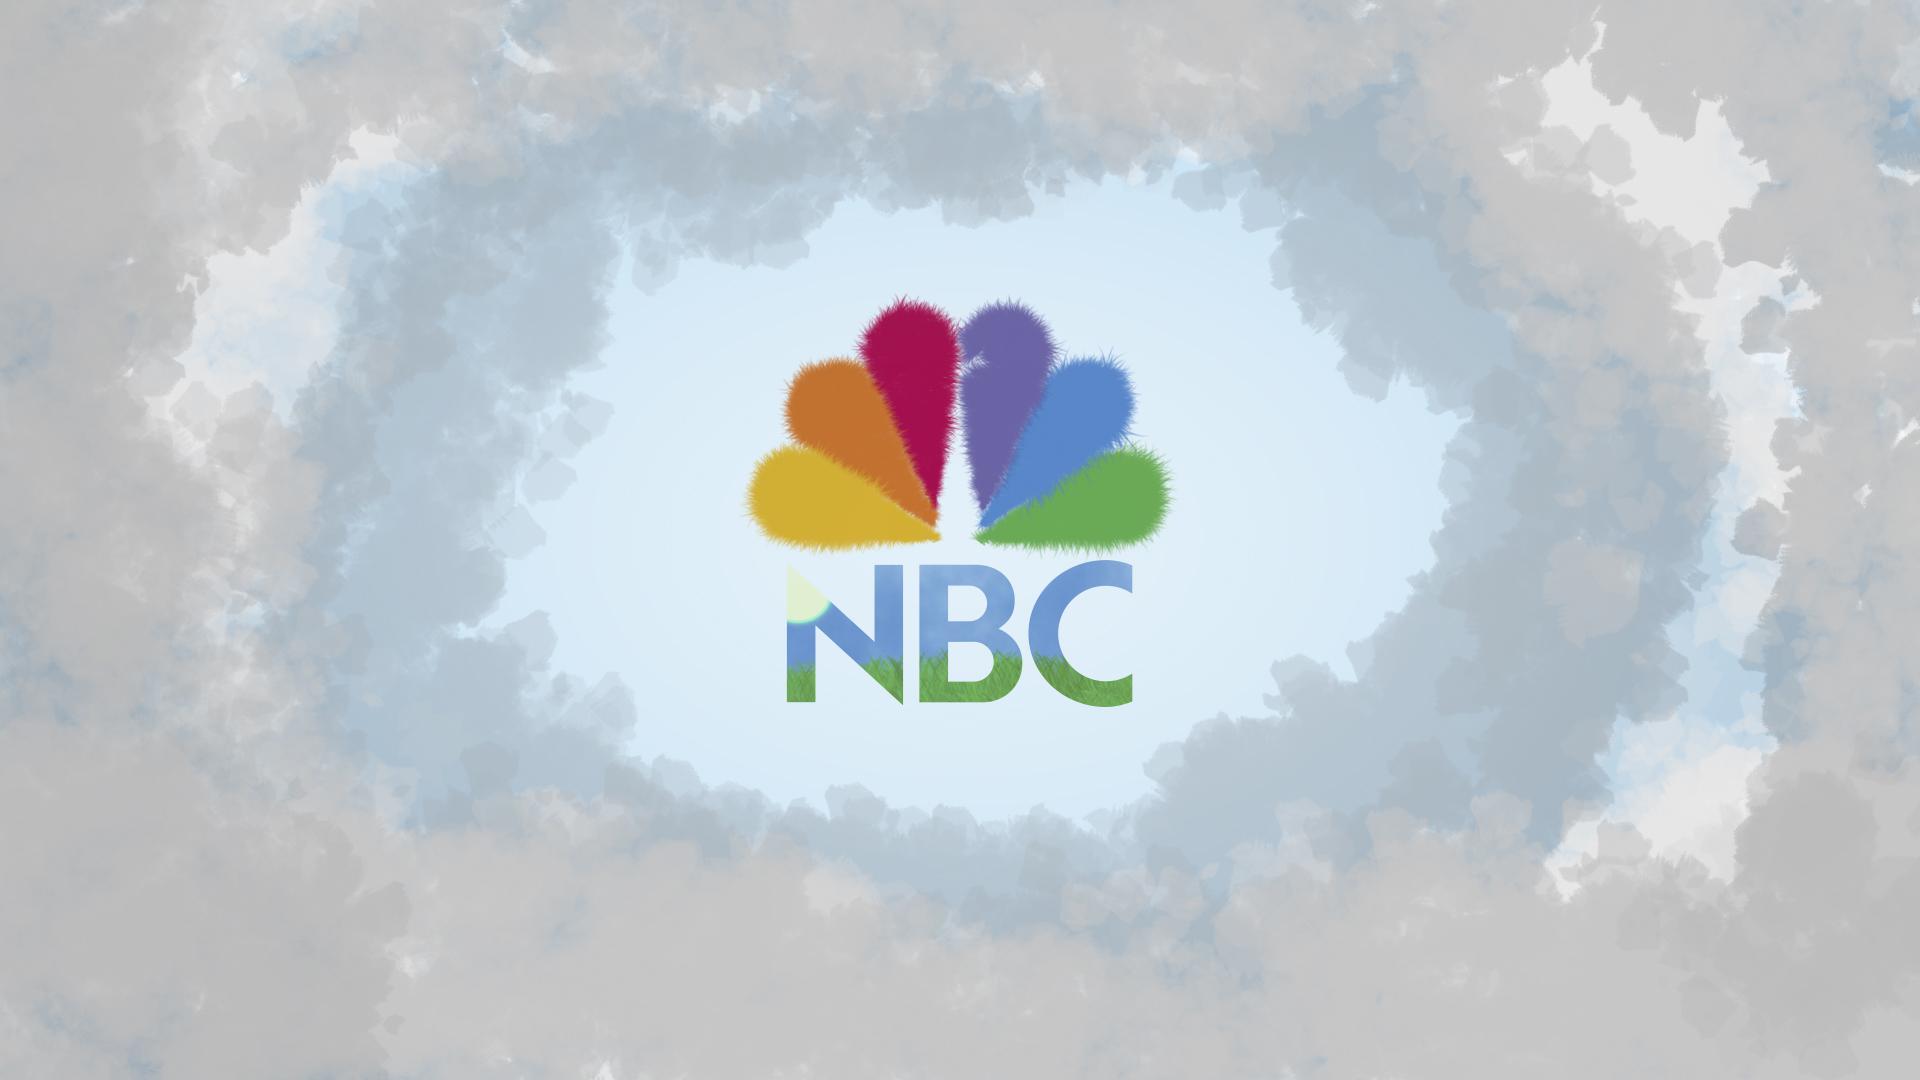 NBCLOGO4.jpg